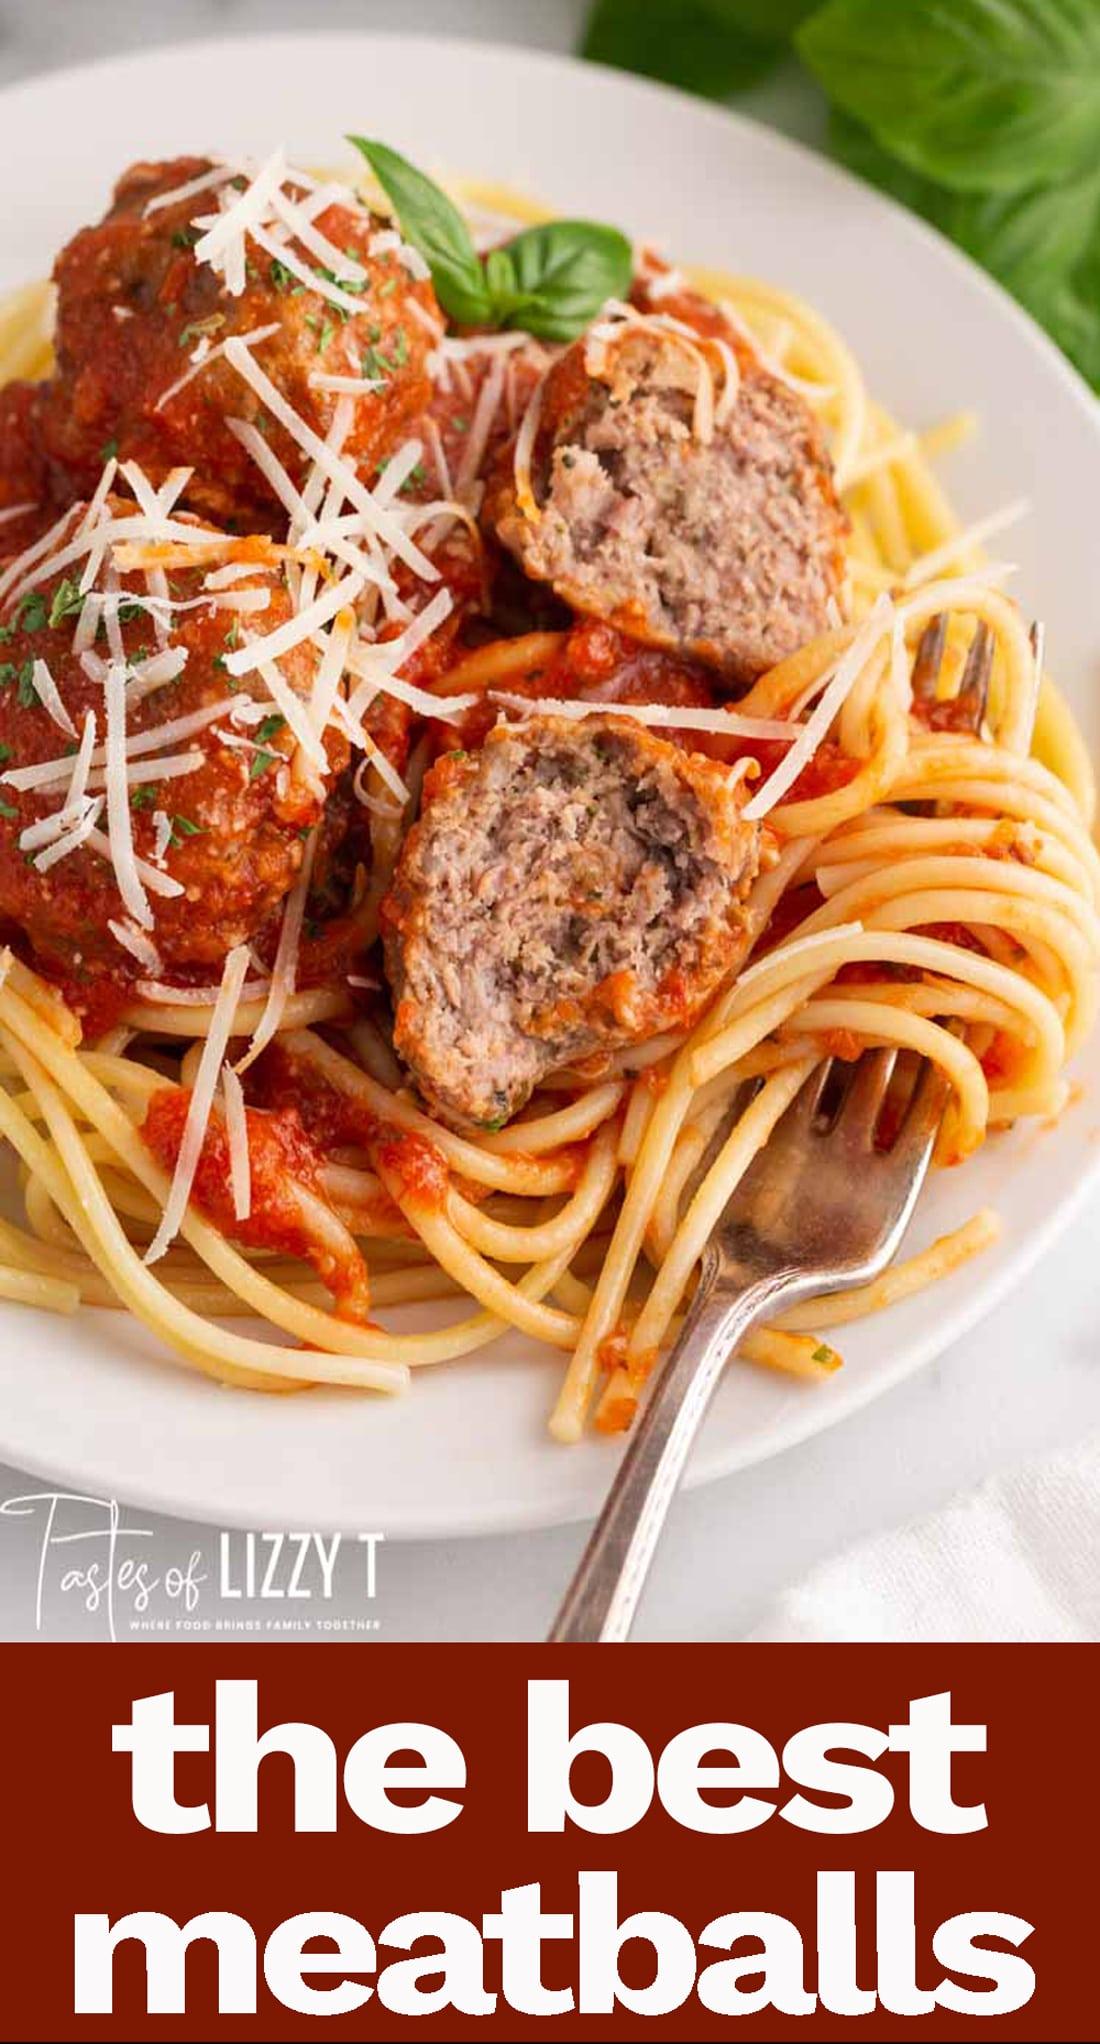 Serve Homemade Italian Meatballs for an easy dinner and leftovers on a bun for lunch. Italian meatballs make a great freezer meal. #meatballs #beef #italian #easydinner via @tastesoflizzyt